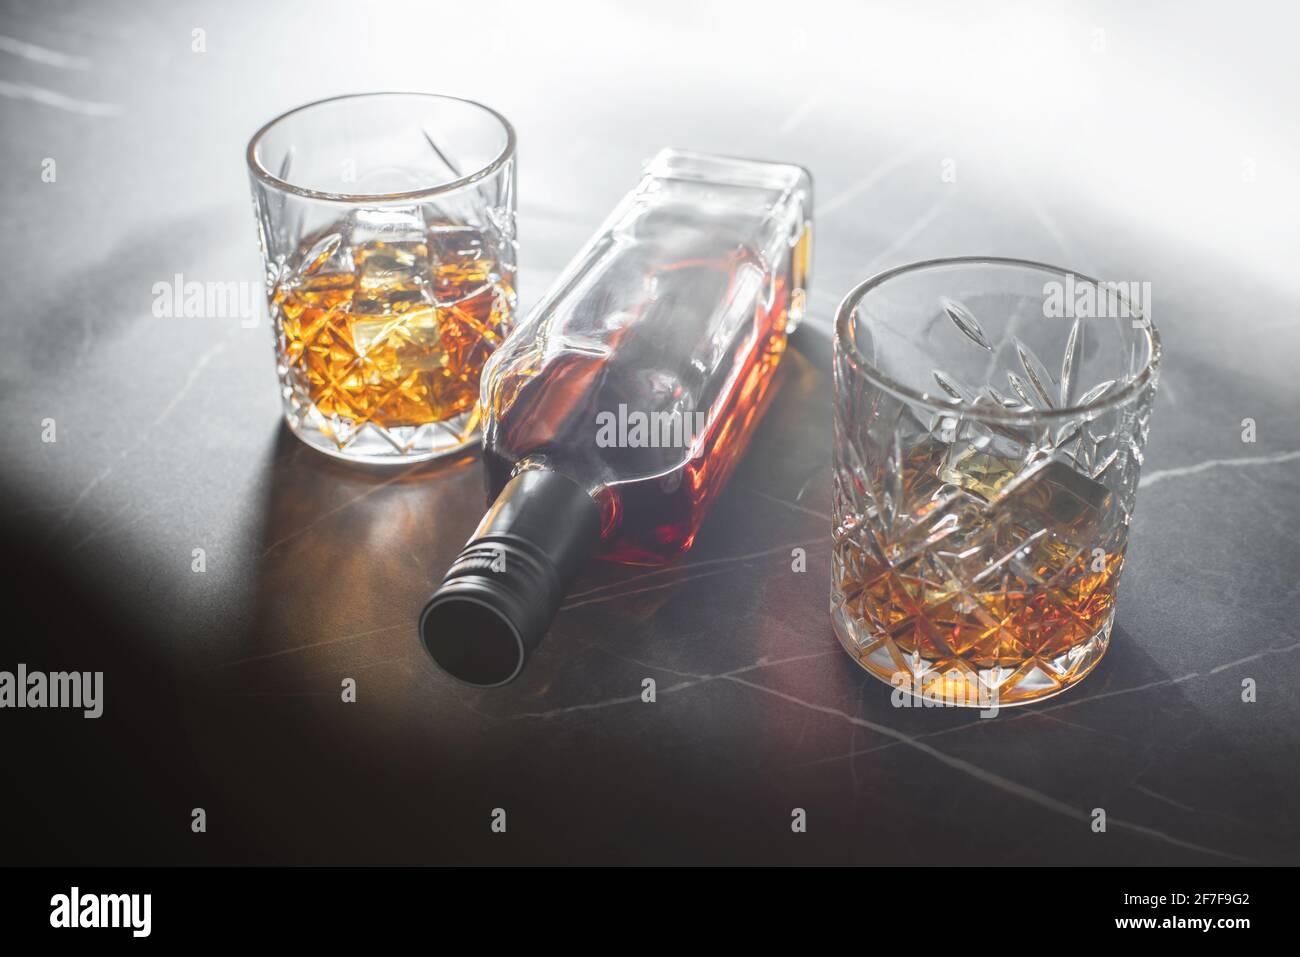 bebida alcohólica, whisky sobre un fondo oscuro de piedra Foto de stock